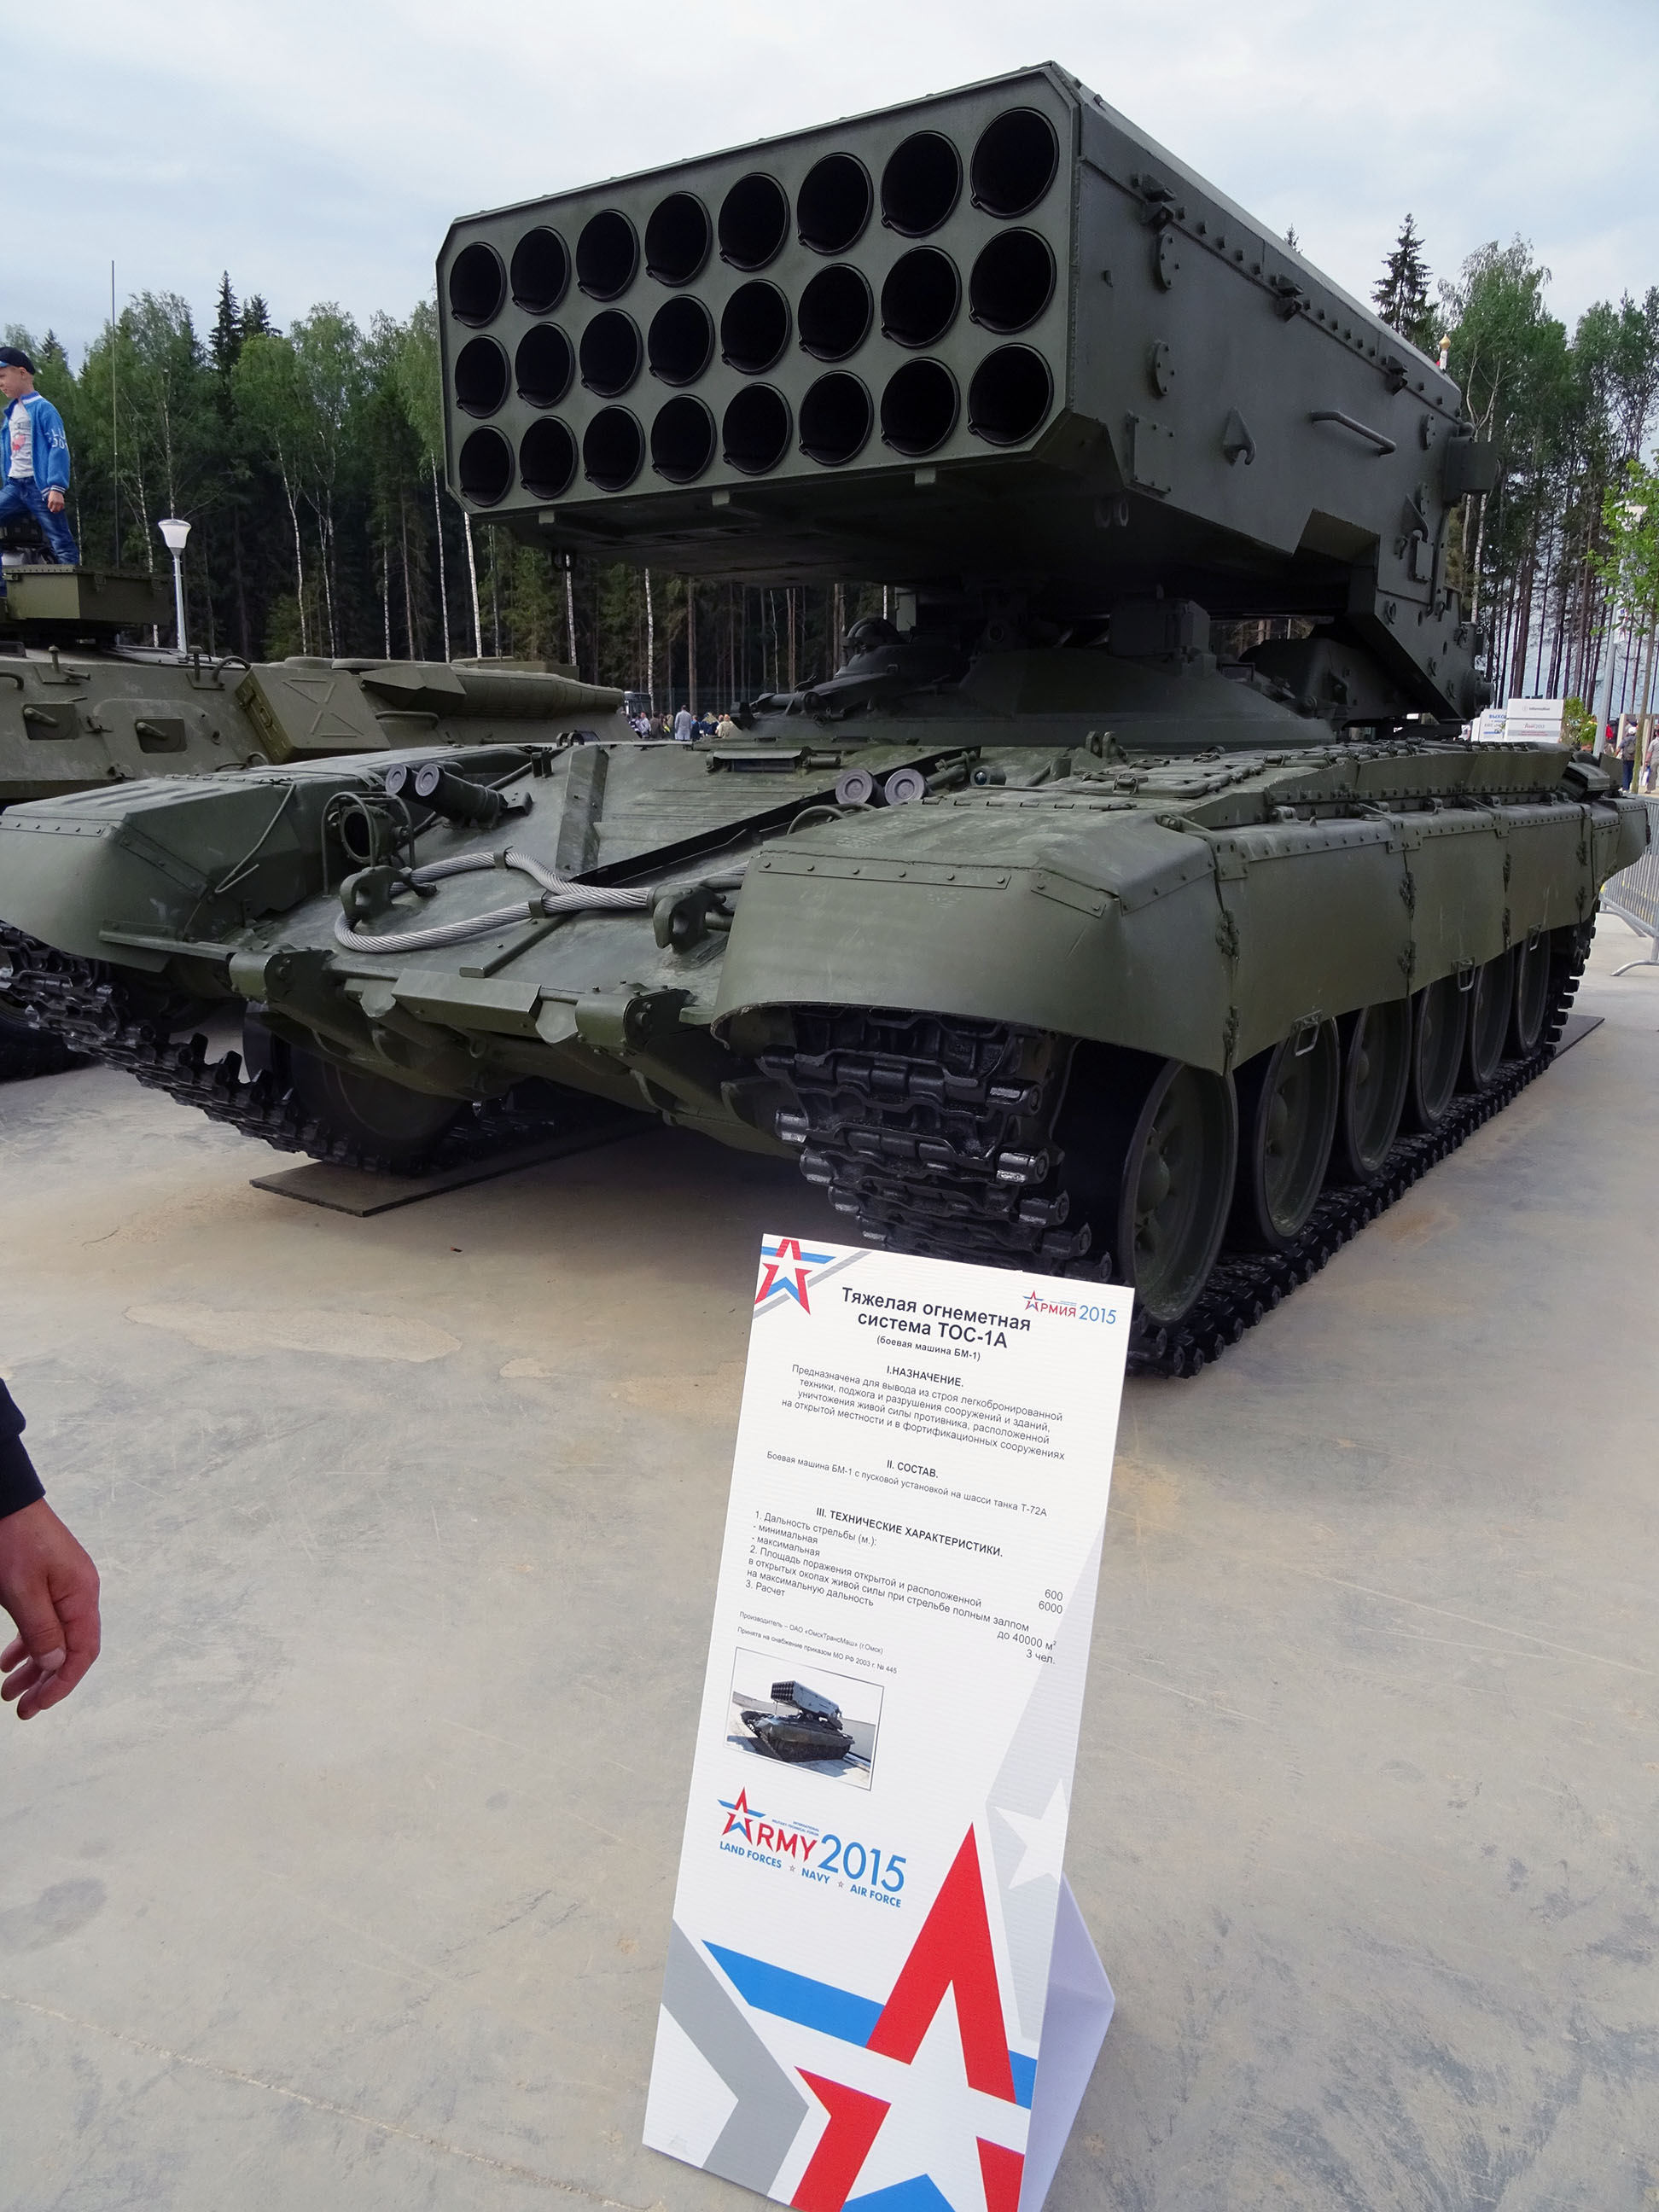 Russian Military Photos and Videos #2 - Page 37 0_8392e_a5fca5e4_orig